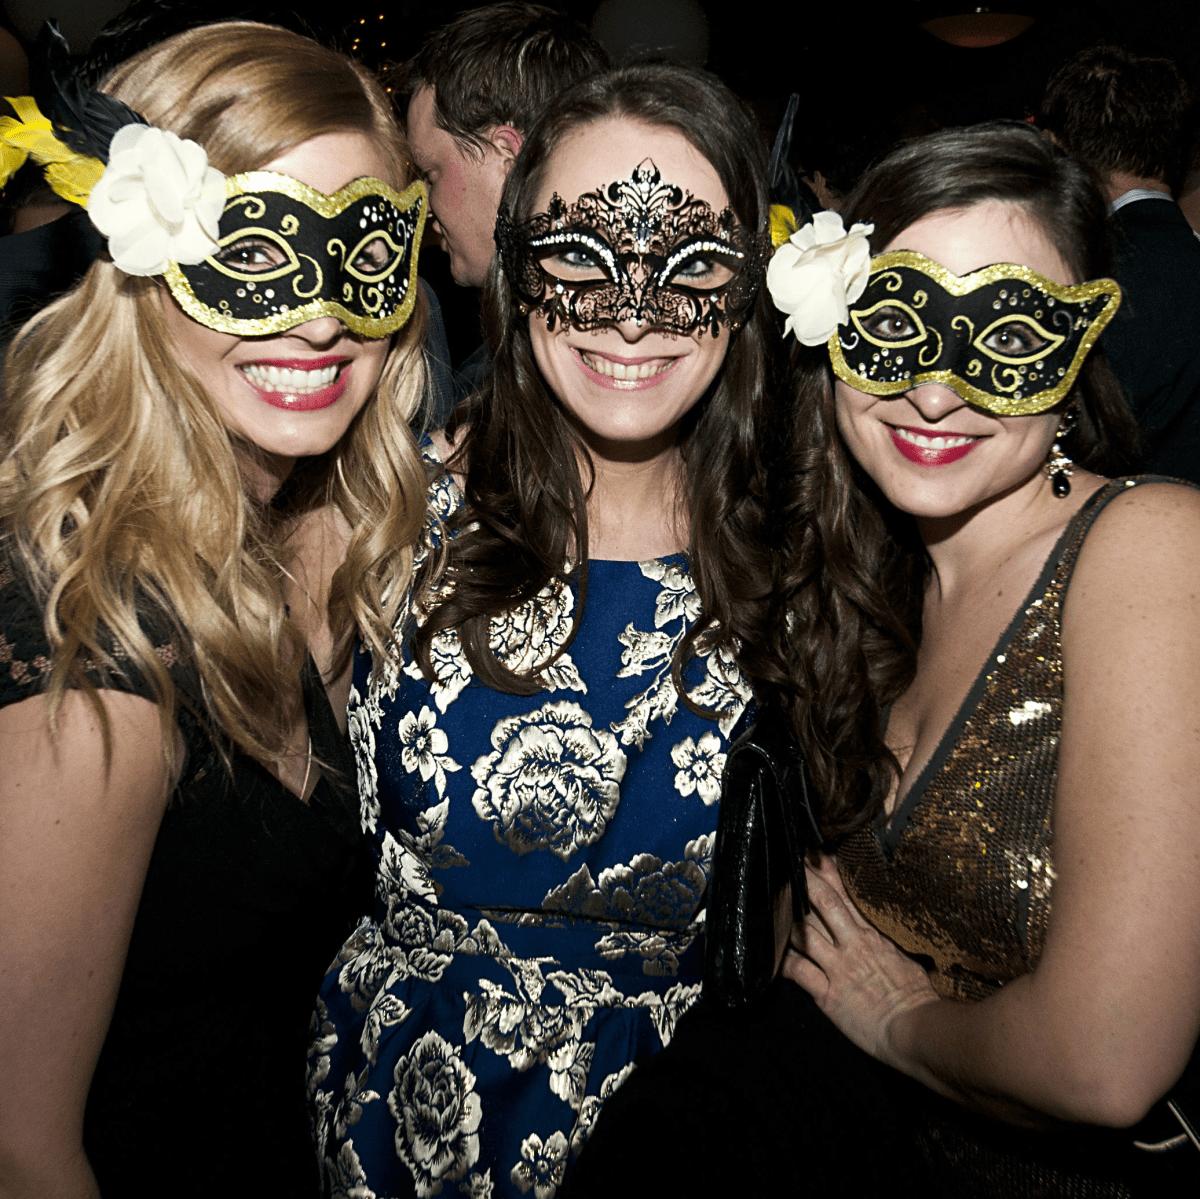 Genesis Young Leaders Masquerade 2015